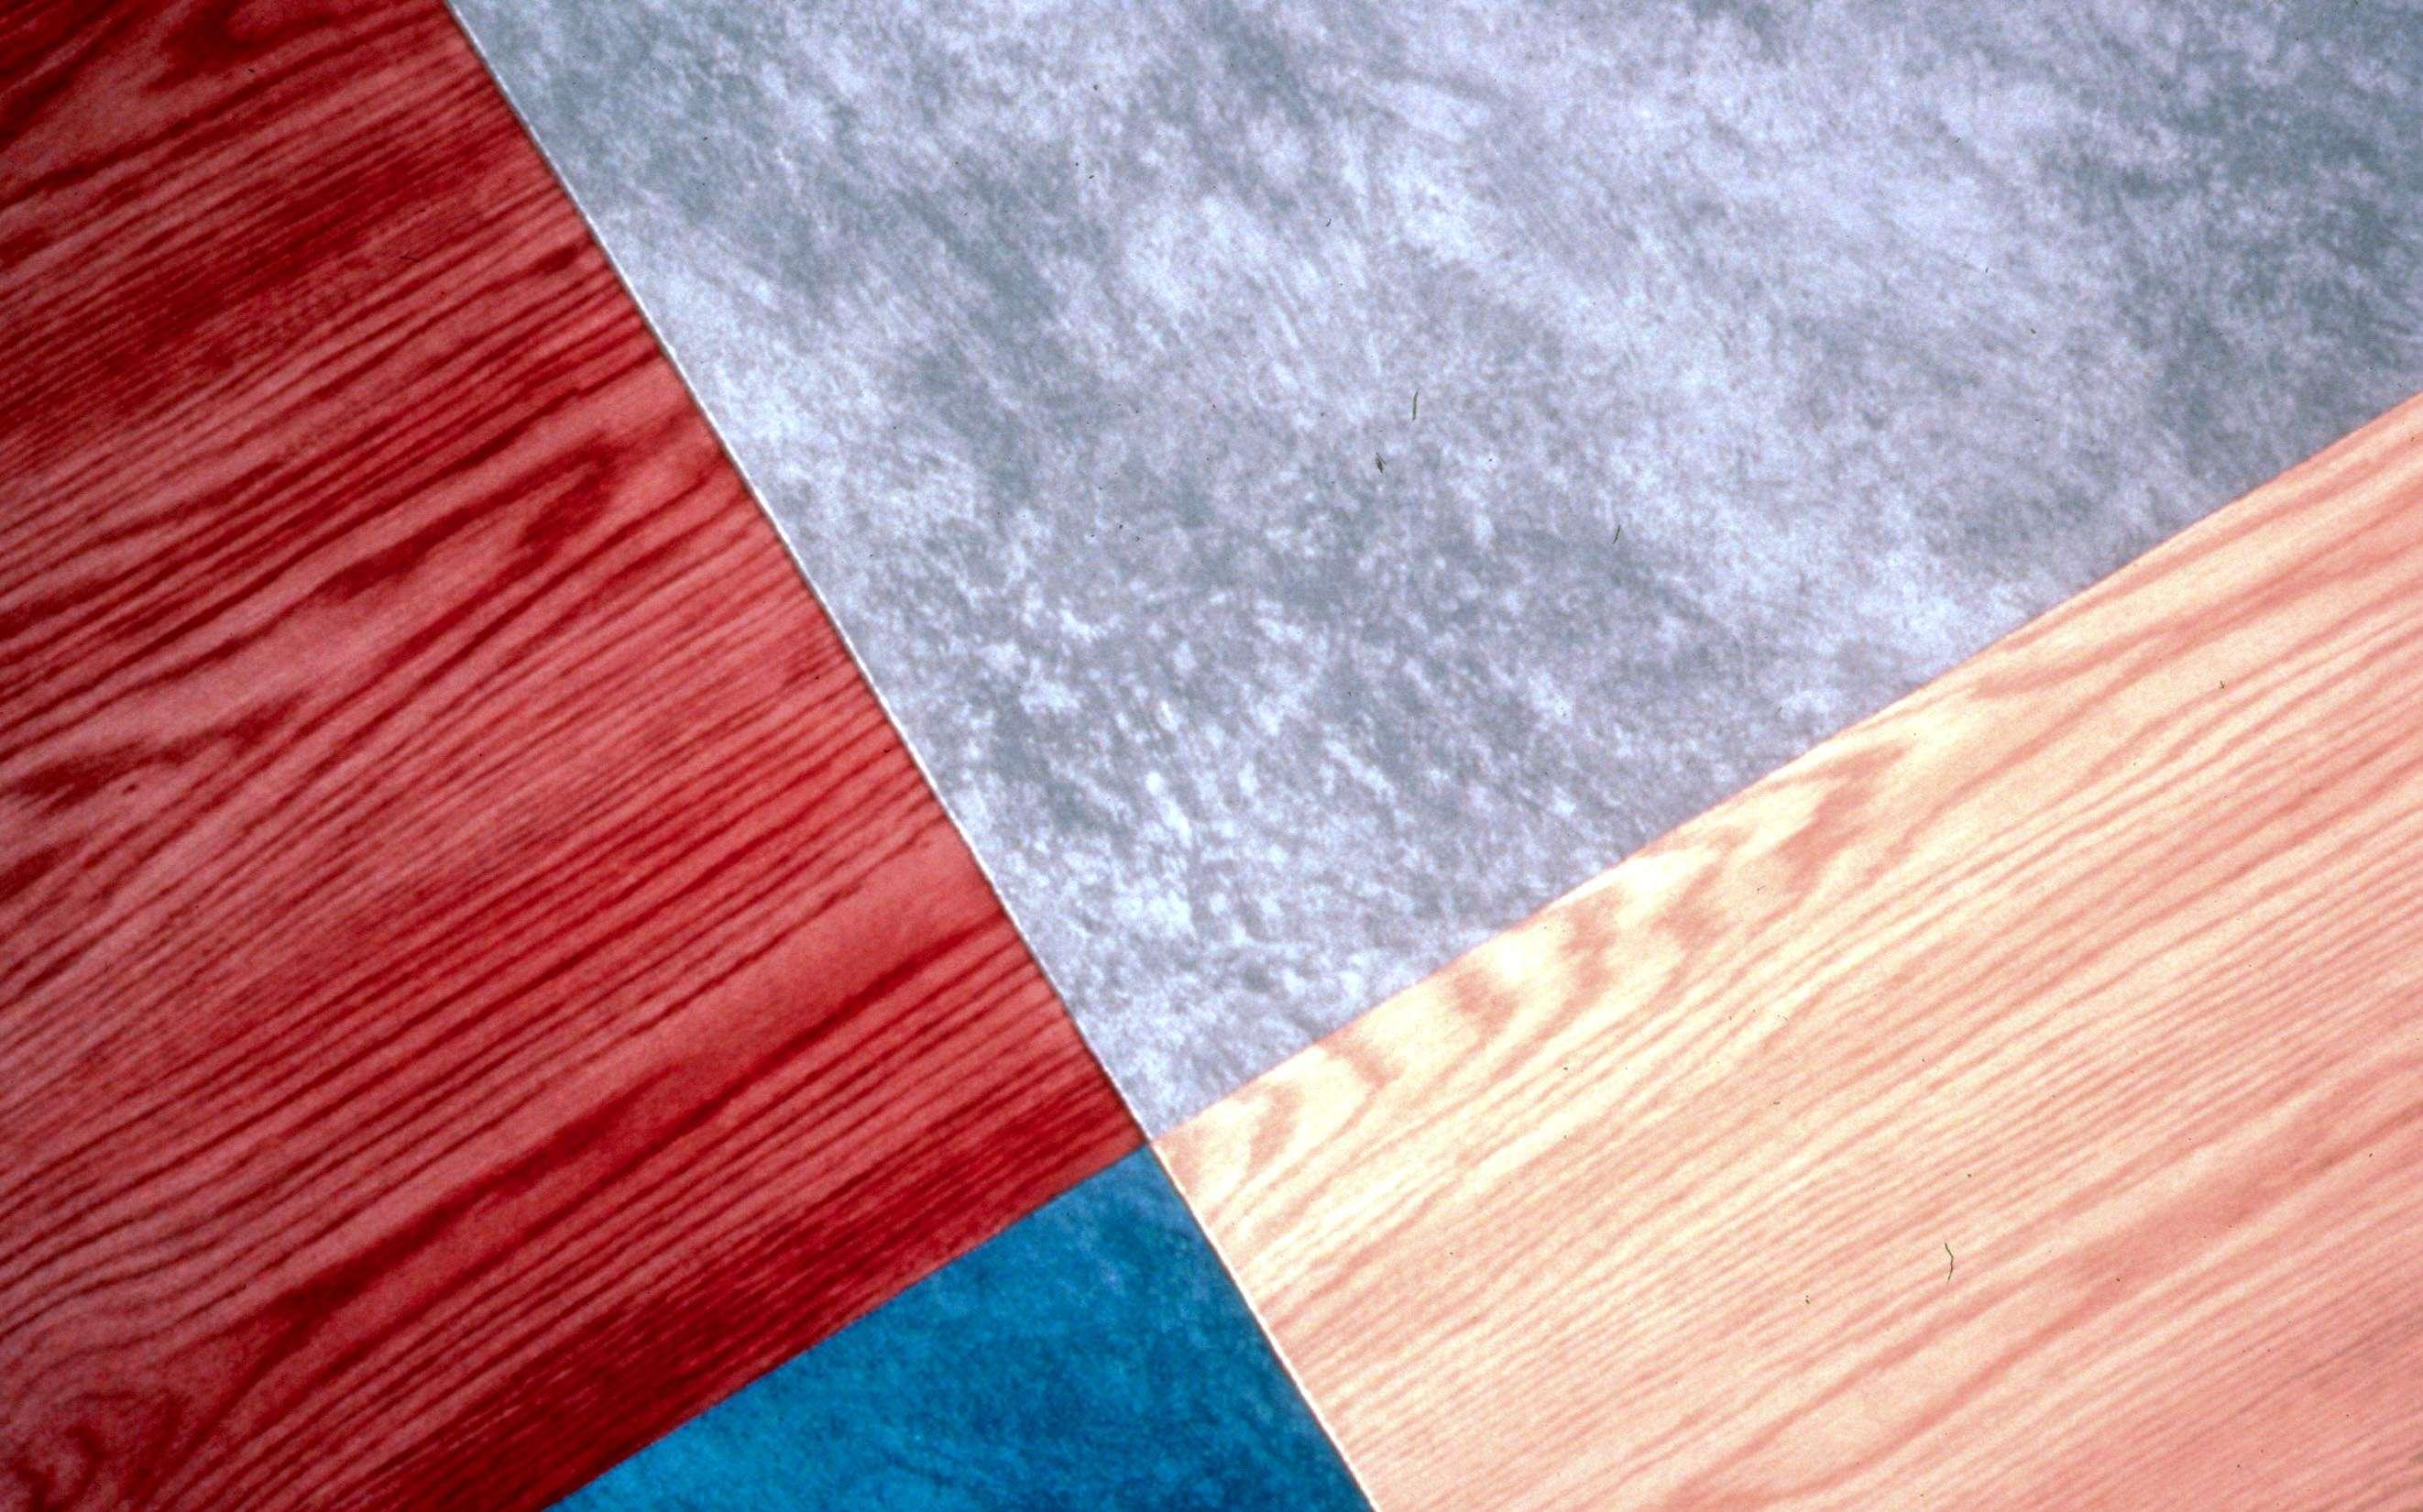 Floor tile adhesive for wooden floors